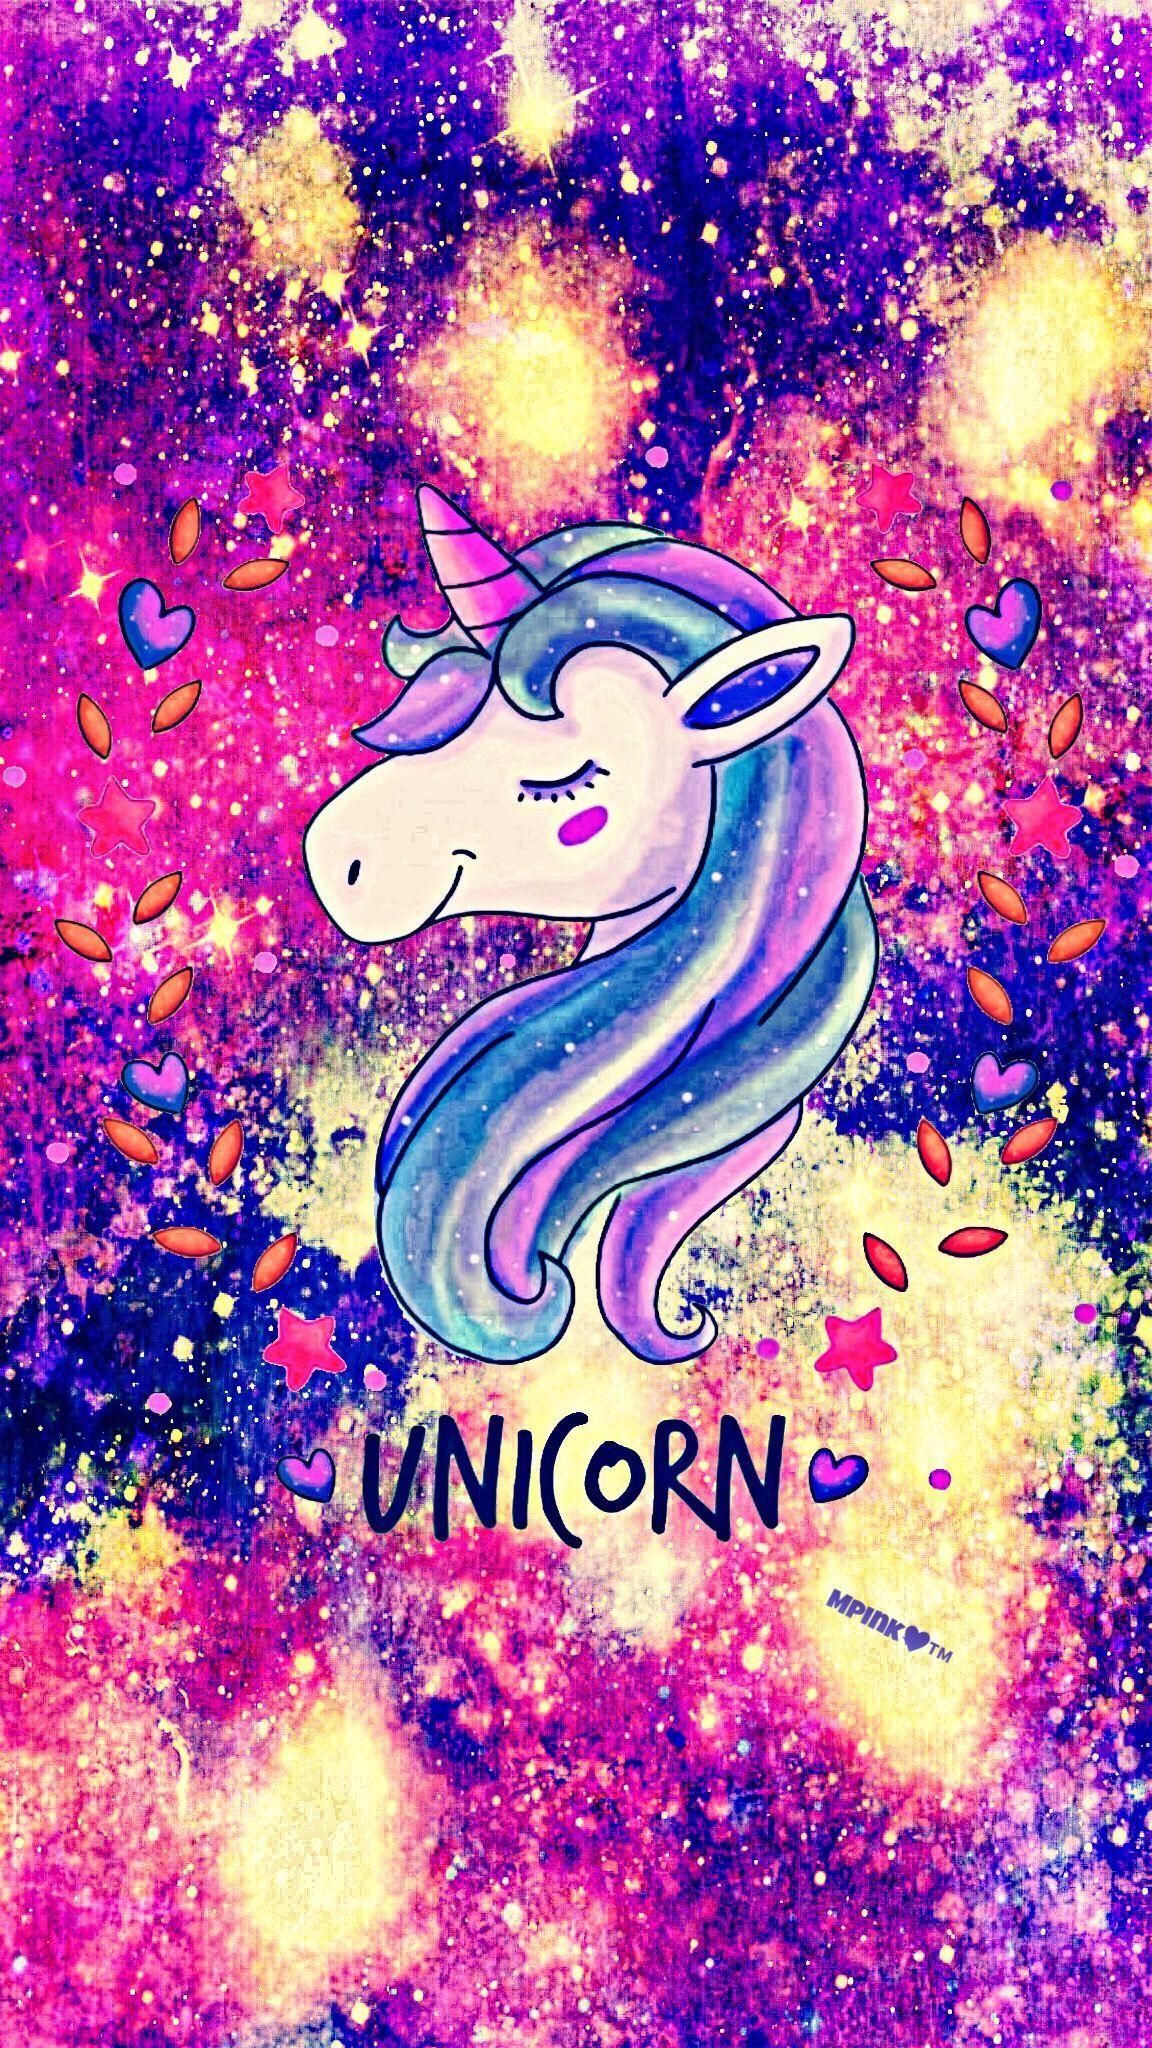 Cute Unicorn Teen Wallpapers For Teenagers Girls And Unicorn Galaxy Wallpaper Iphone 576x1024 Download Hd Wallpaper Wallpapertip